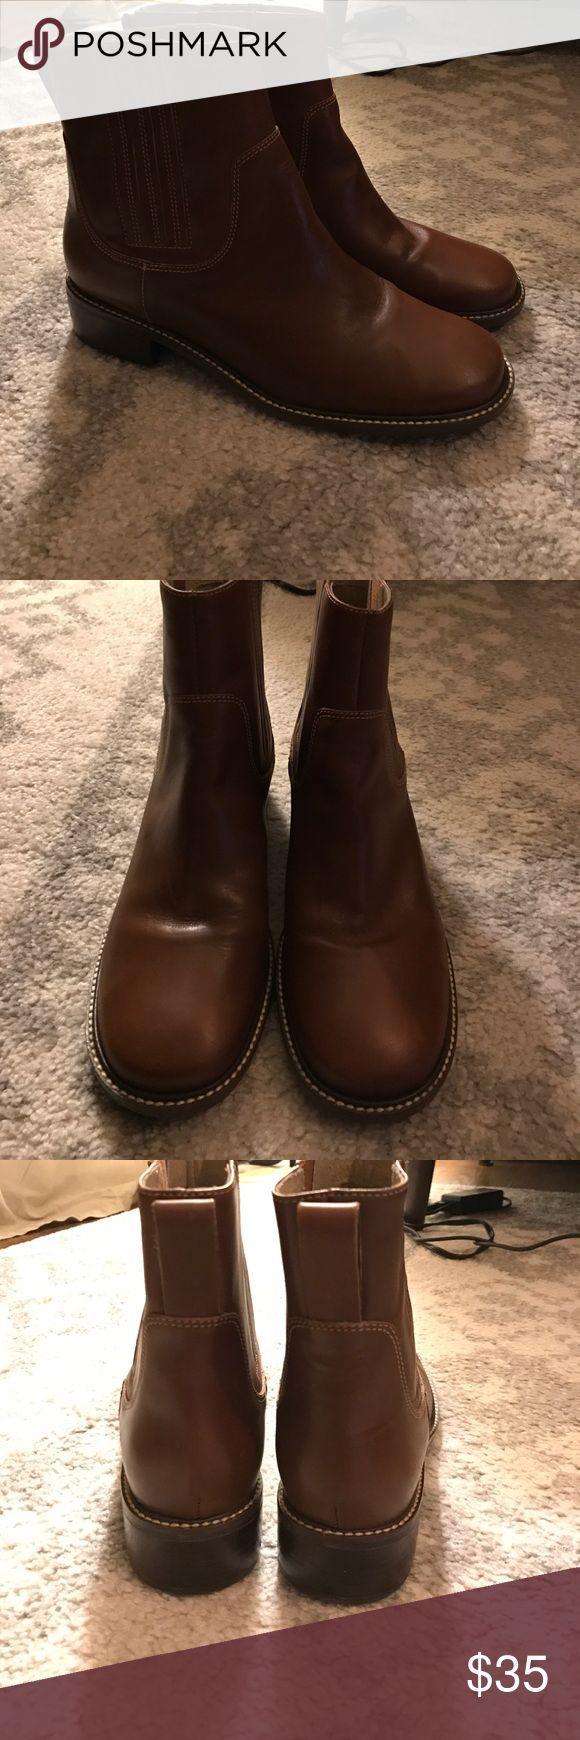 LL Bean Boots VGUC. Run a little big. L.L. Bean Shoes Ankle Boots & Booties